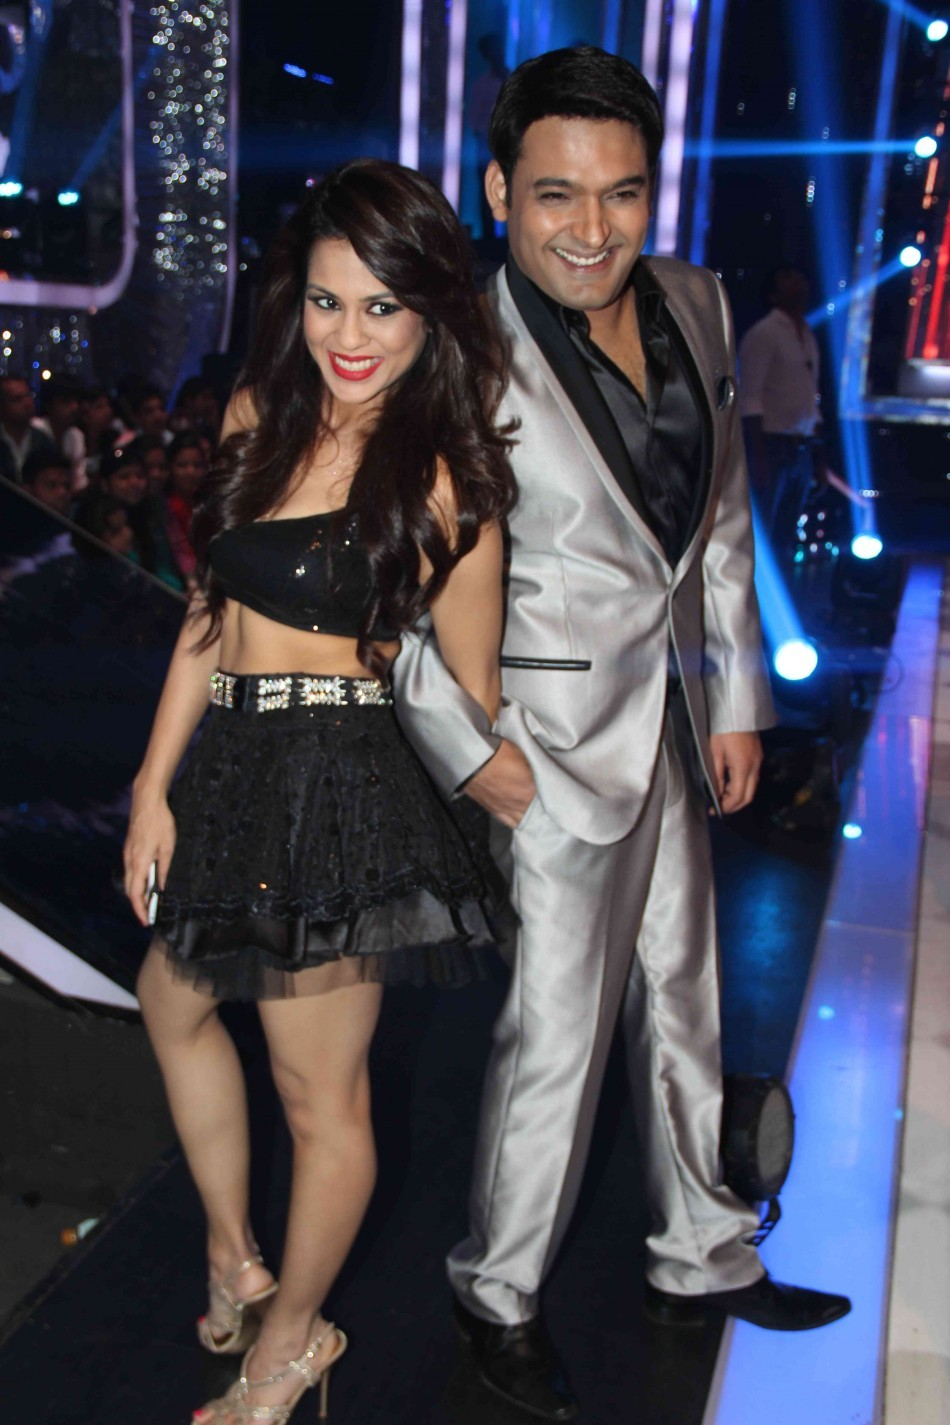 Show host Kapil with contestant Sana Saeed (photo Varinder Chawla)